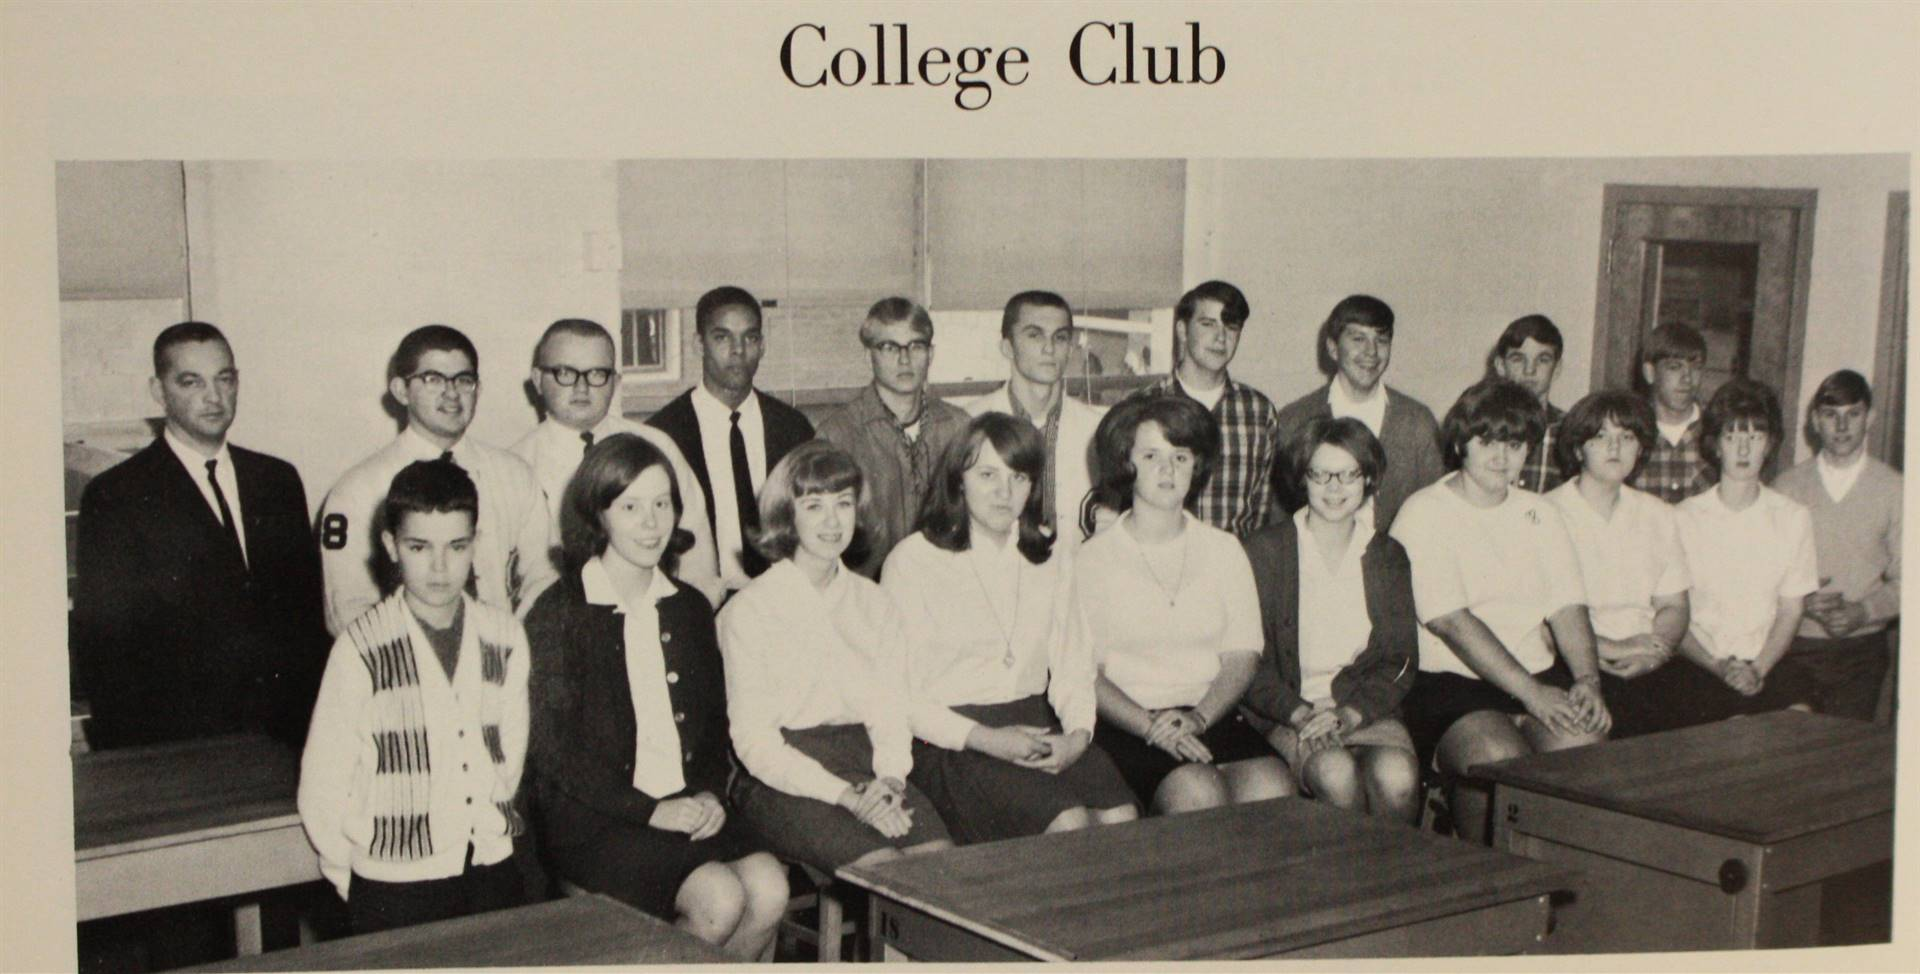 1967 College club